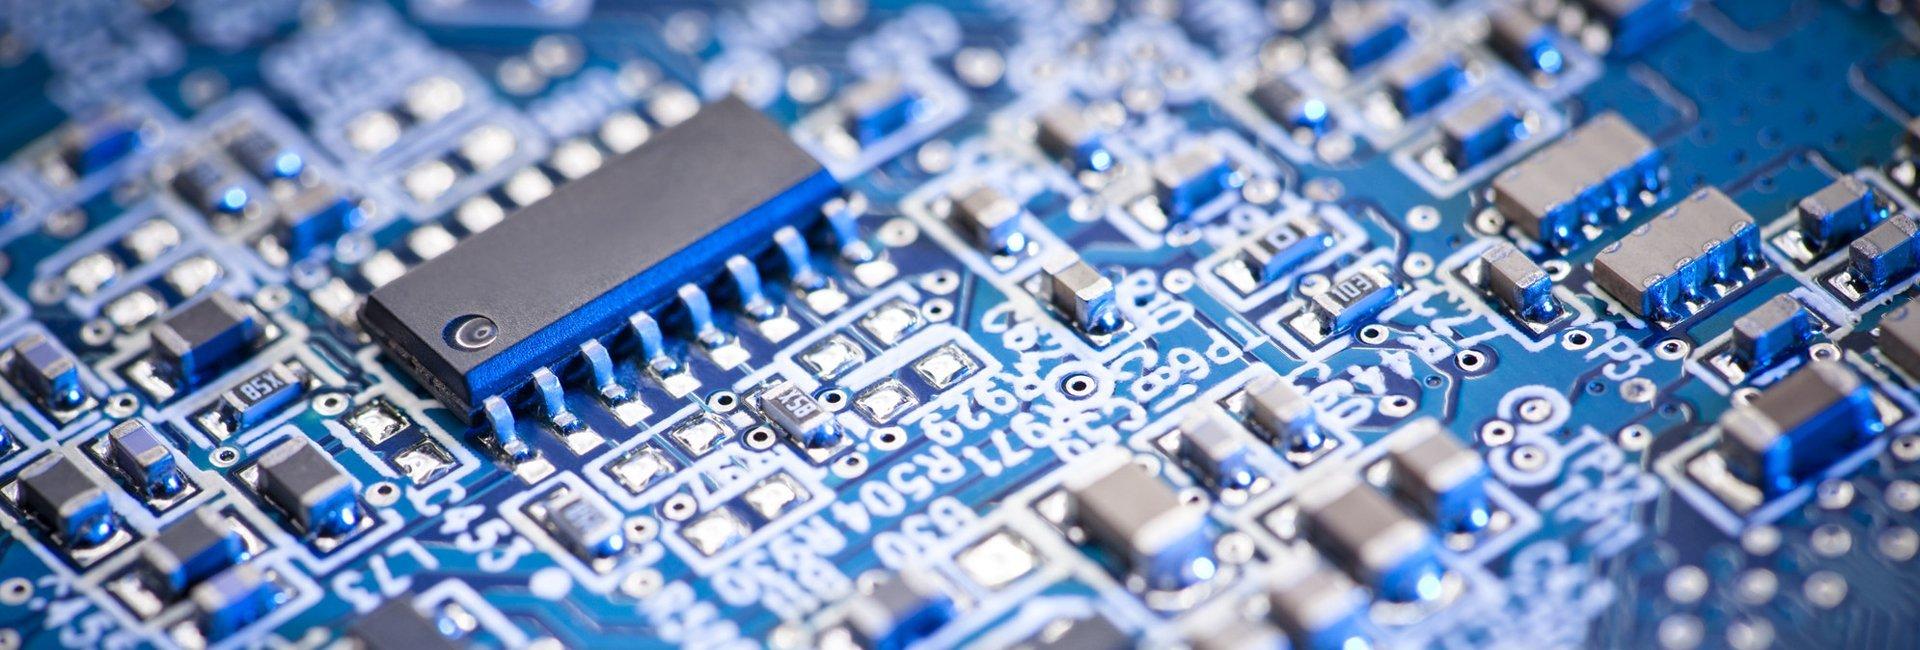 Industrial Equipment Repair Irridian Electronics Printing Machine Prices Buy Circuit Board Machinecircuit